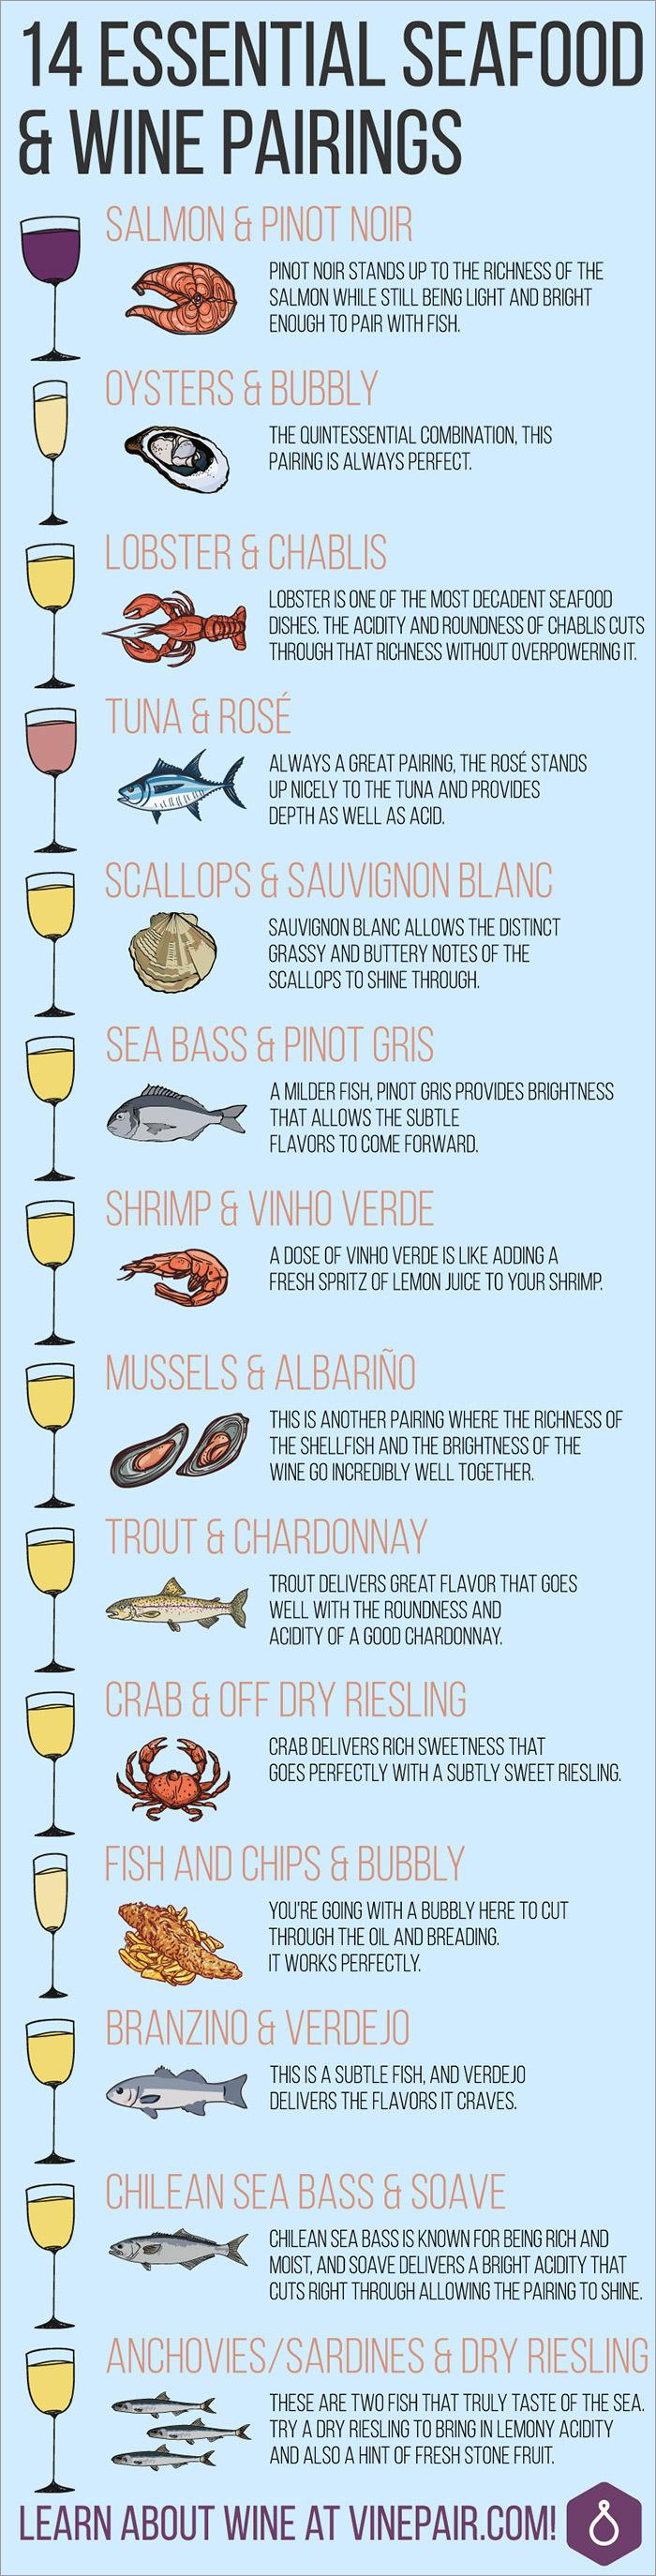 wine-wish-list